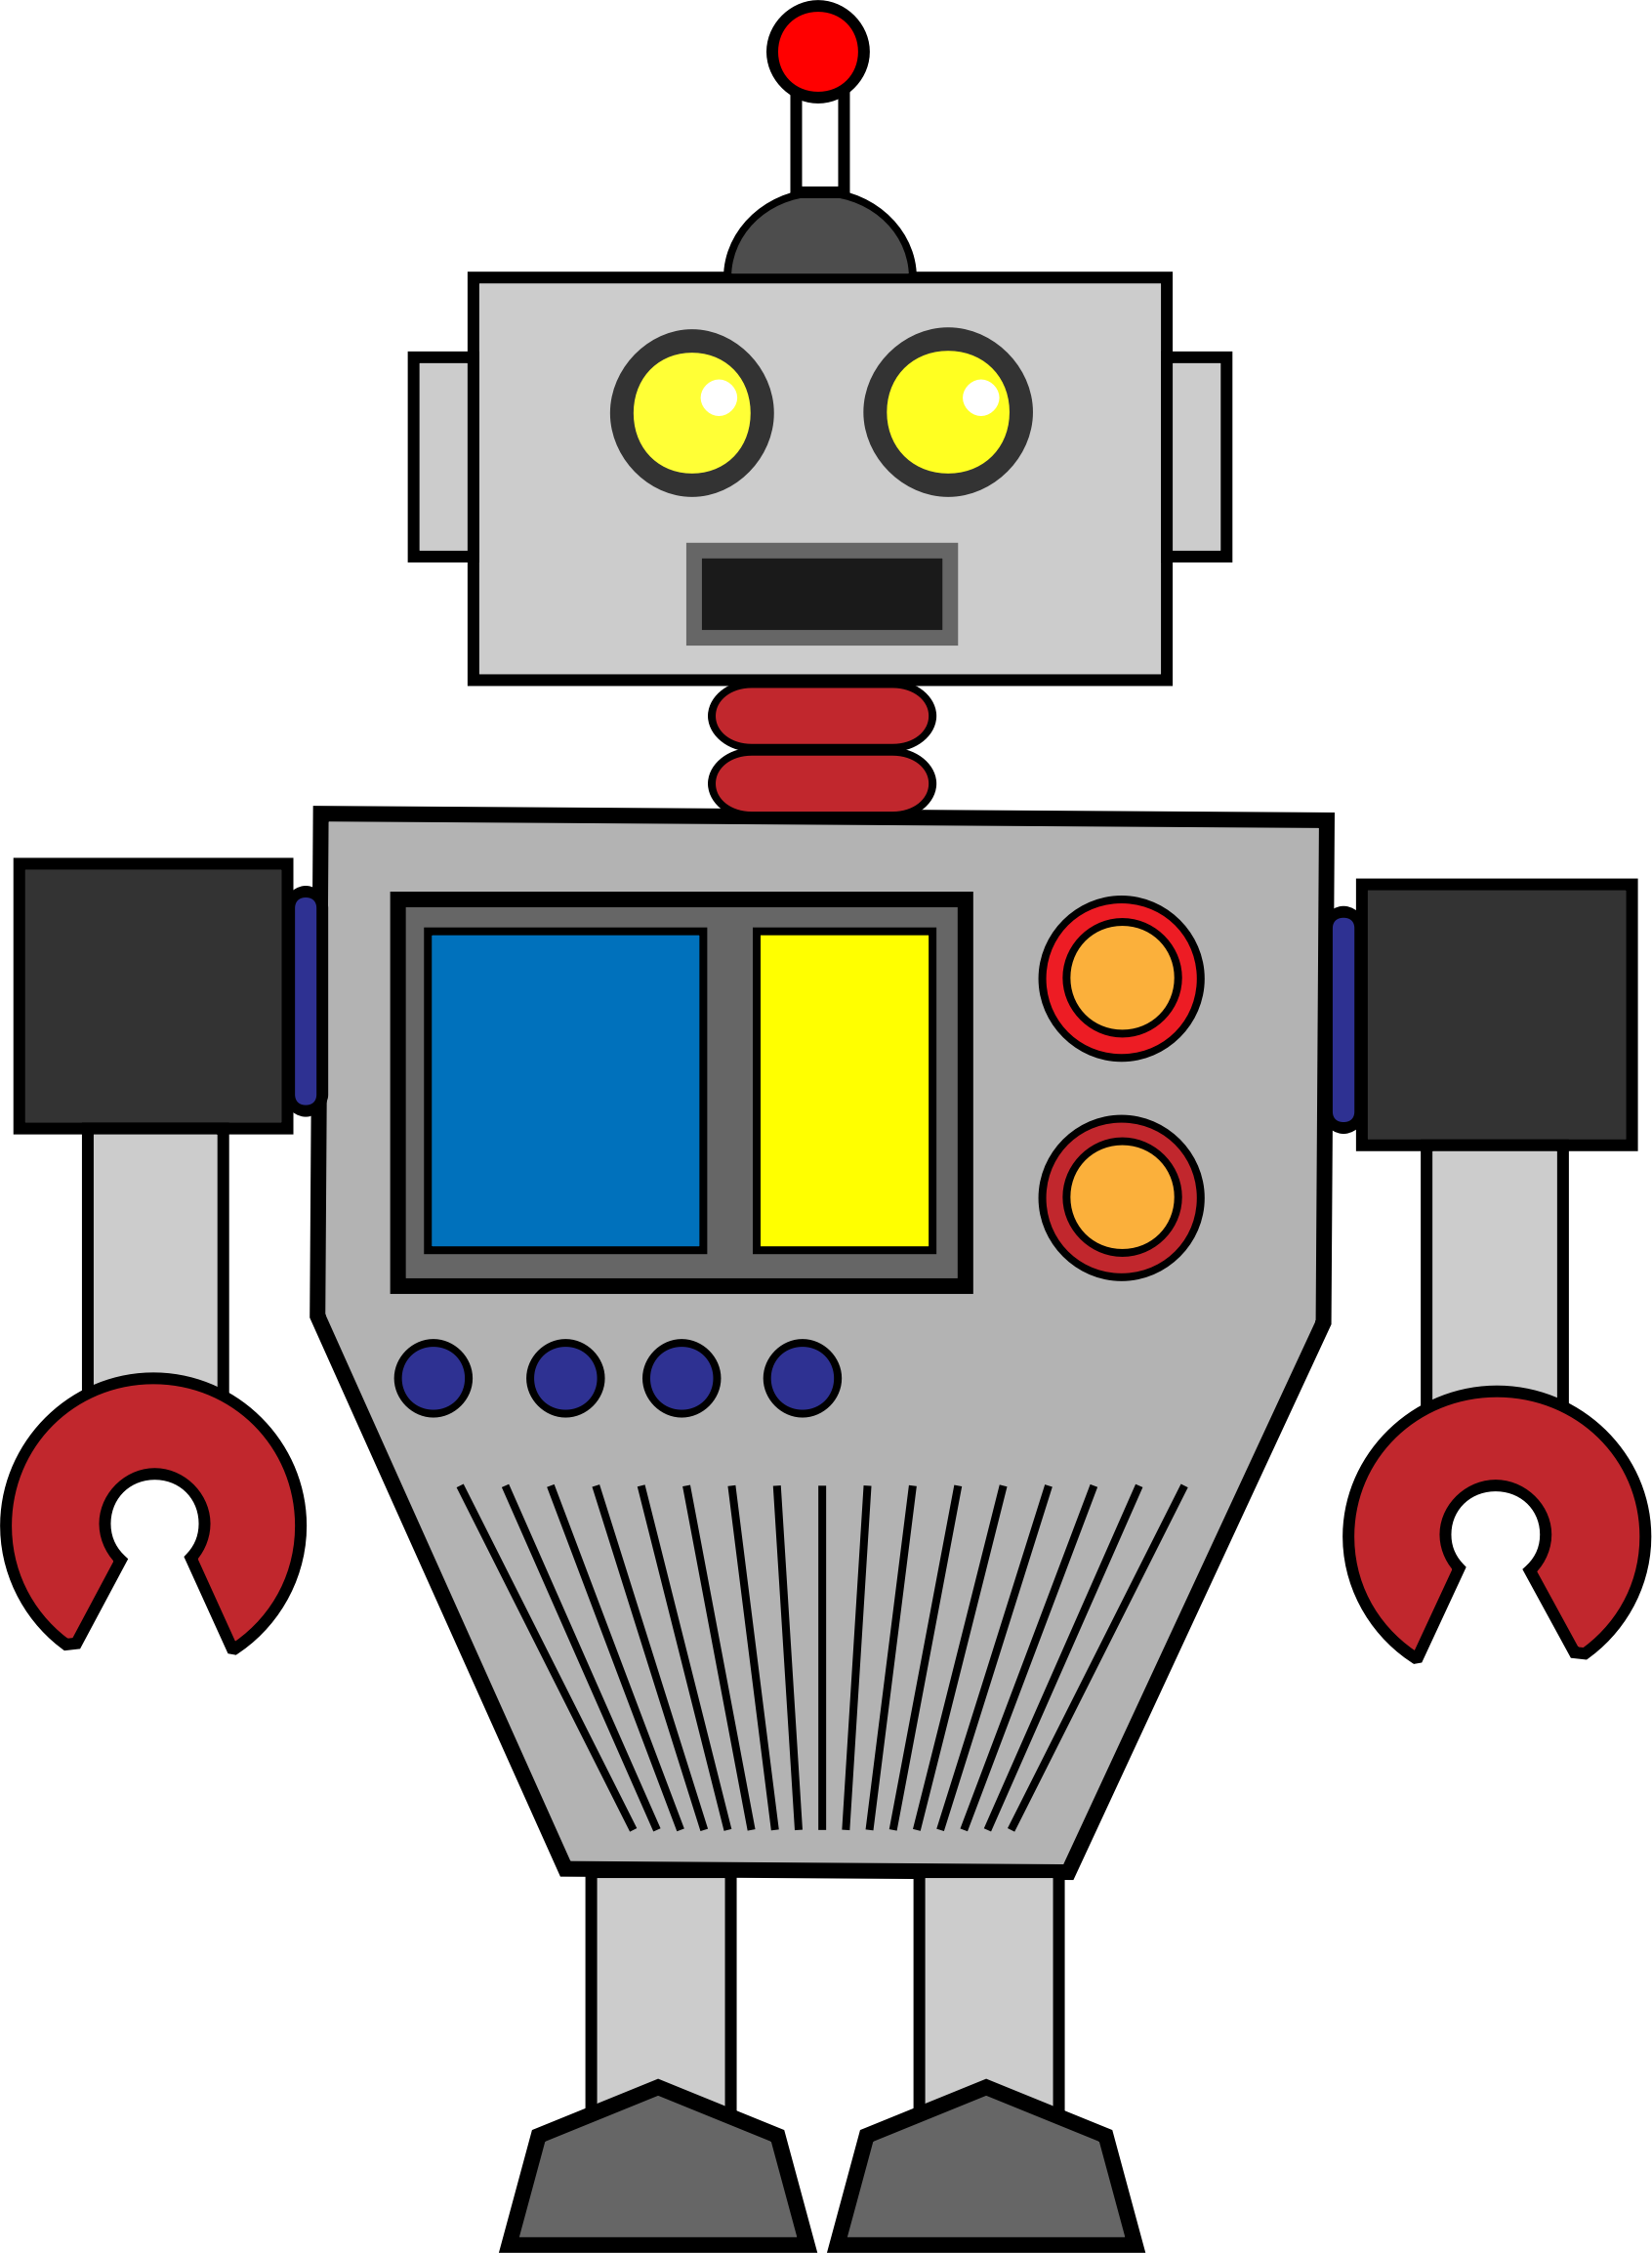 Robot car clipart banner transparent stock Robot PNG images free download banner transparent stock